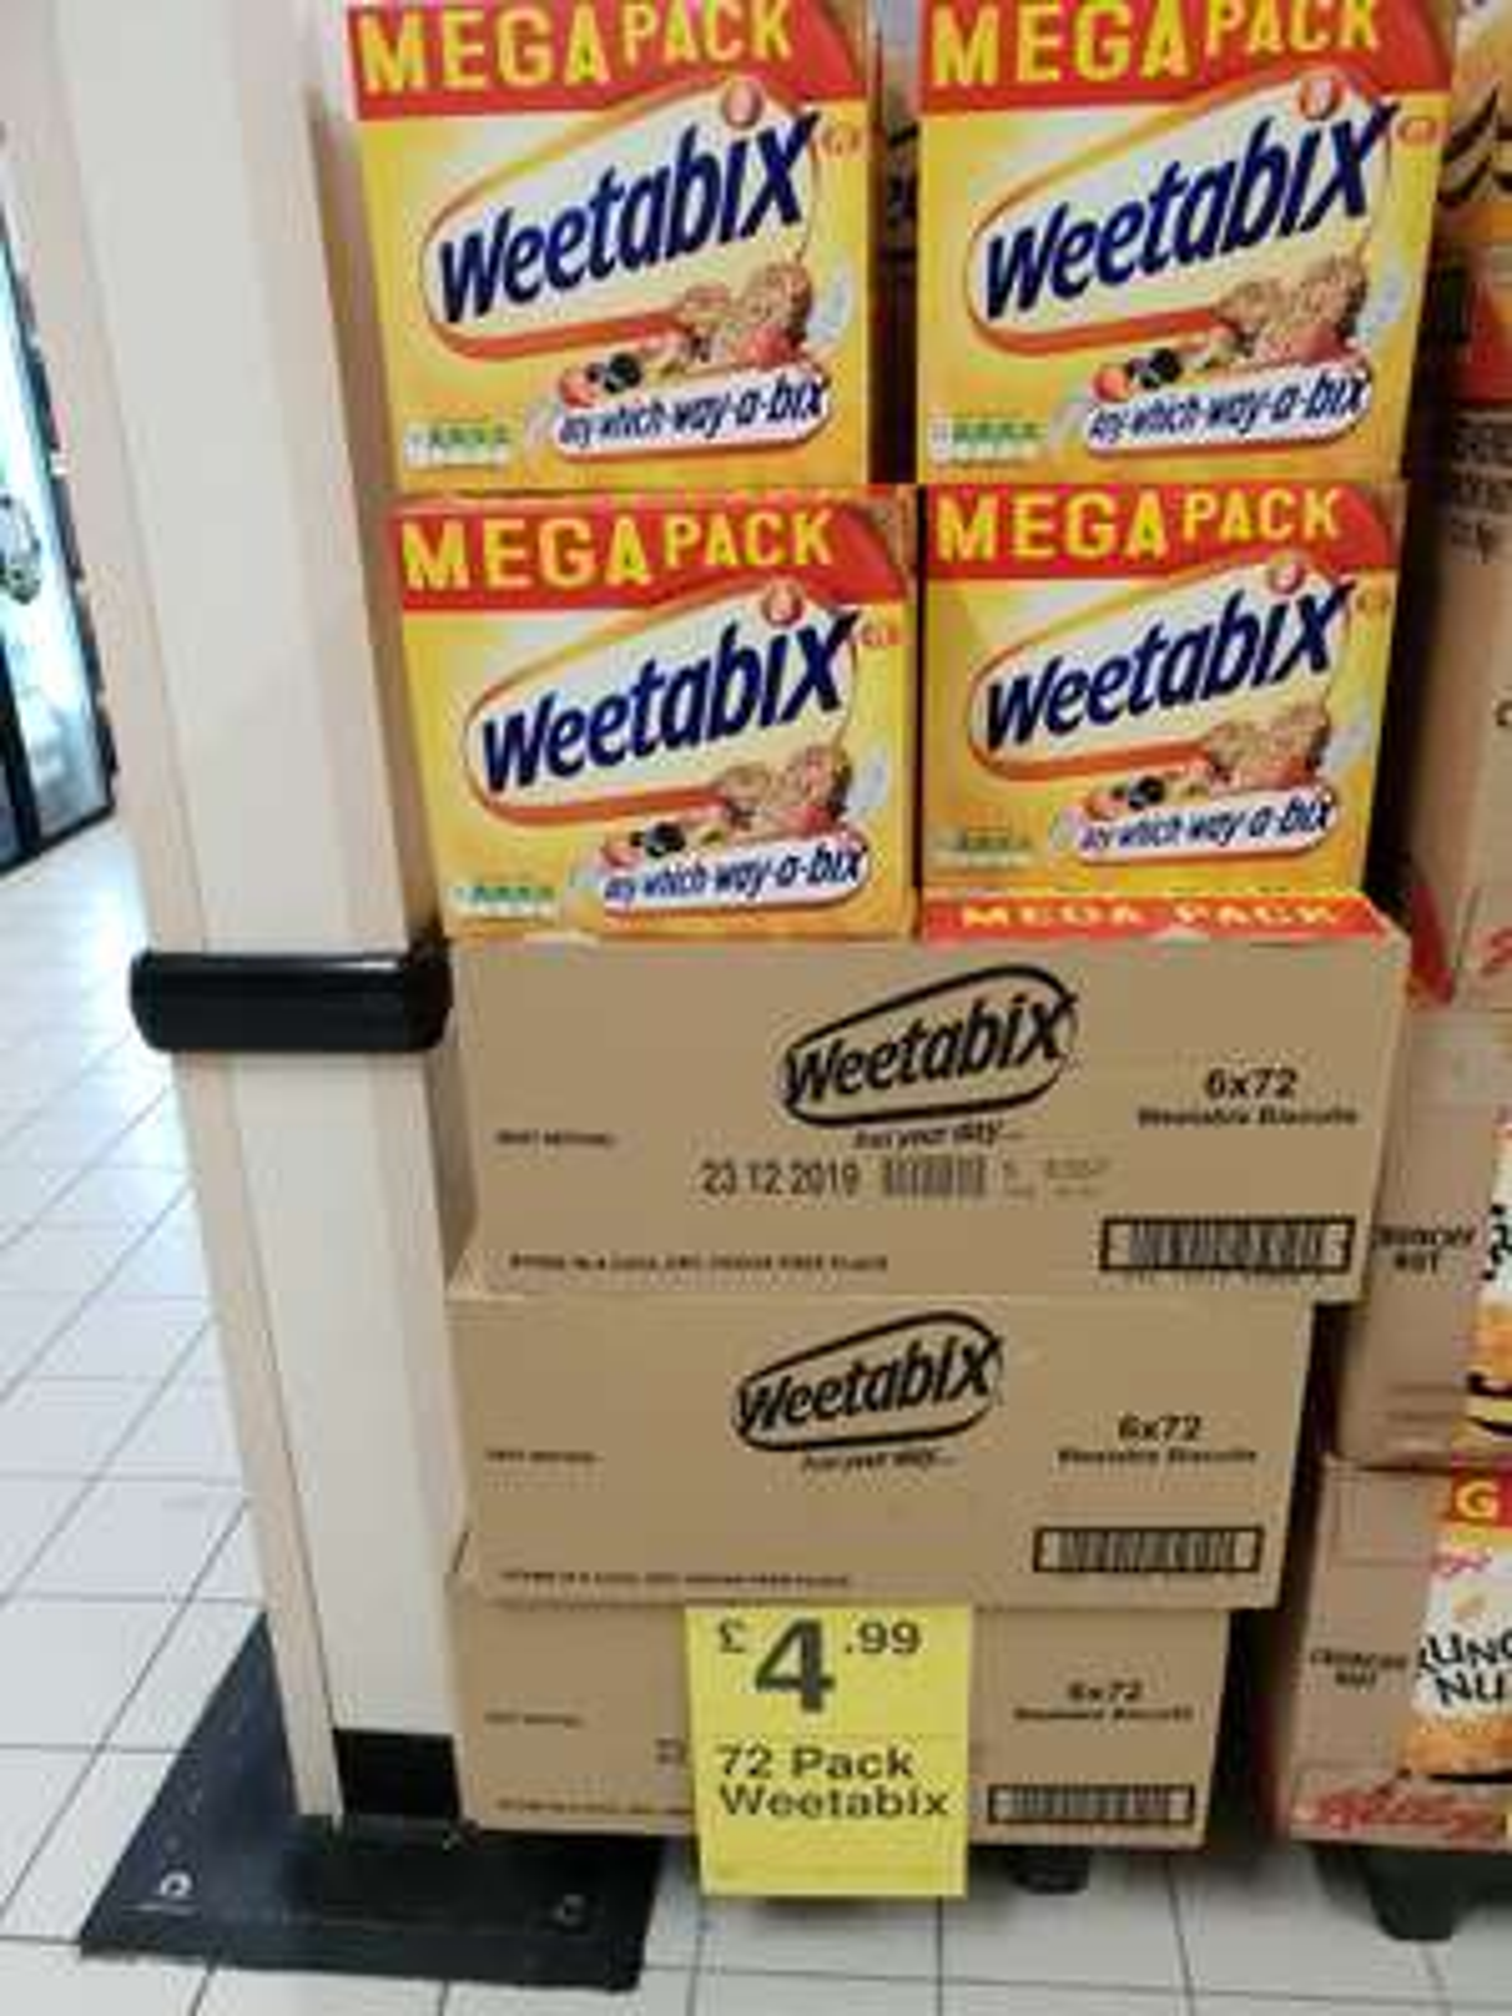 Weetabix 72 pack £4.99 at Farmfoods